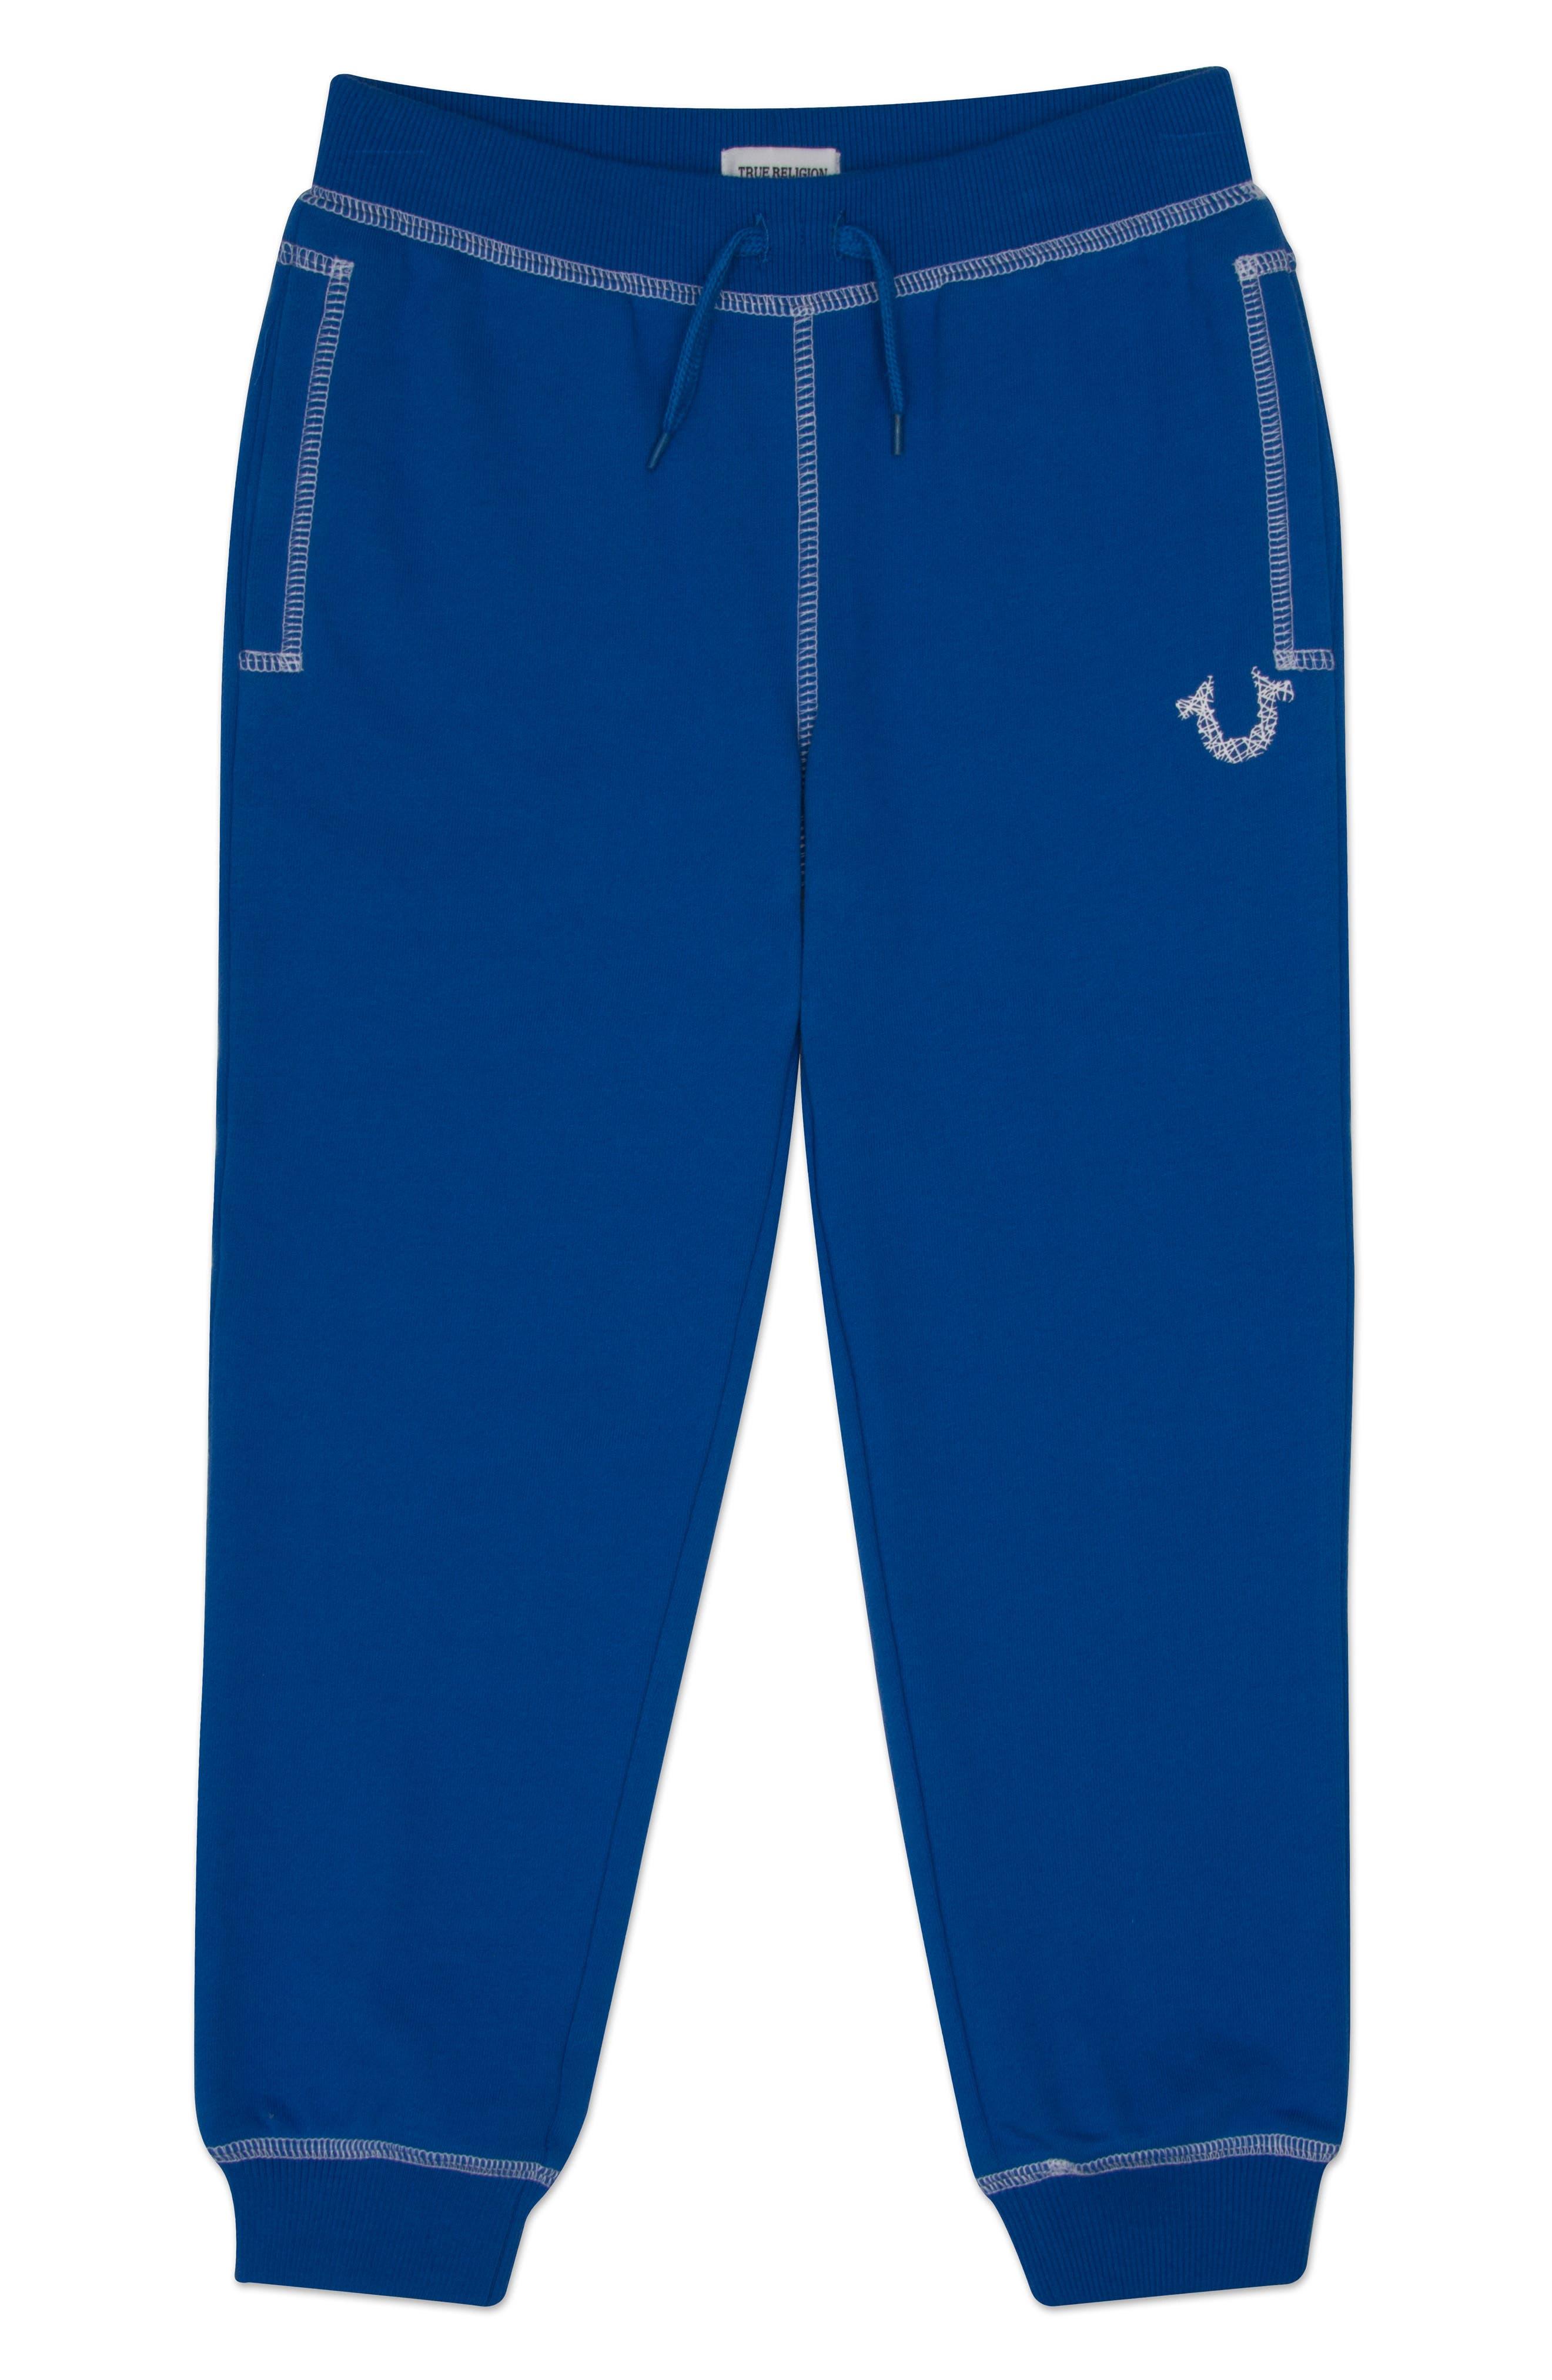 Alternate Image 1 Selected - True Religion Brand Jeans Shoestring Sweatpants (Big Boys)